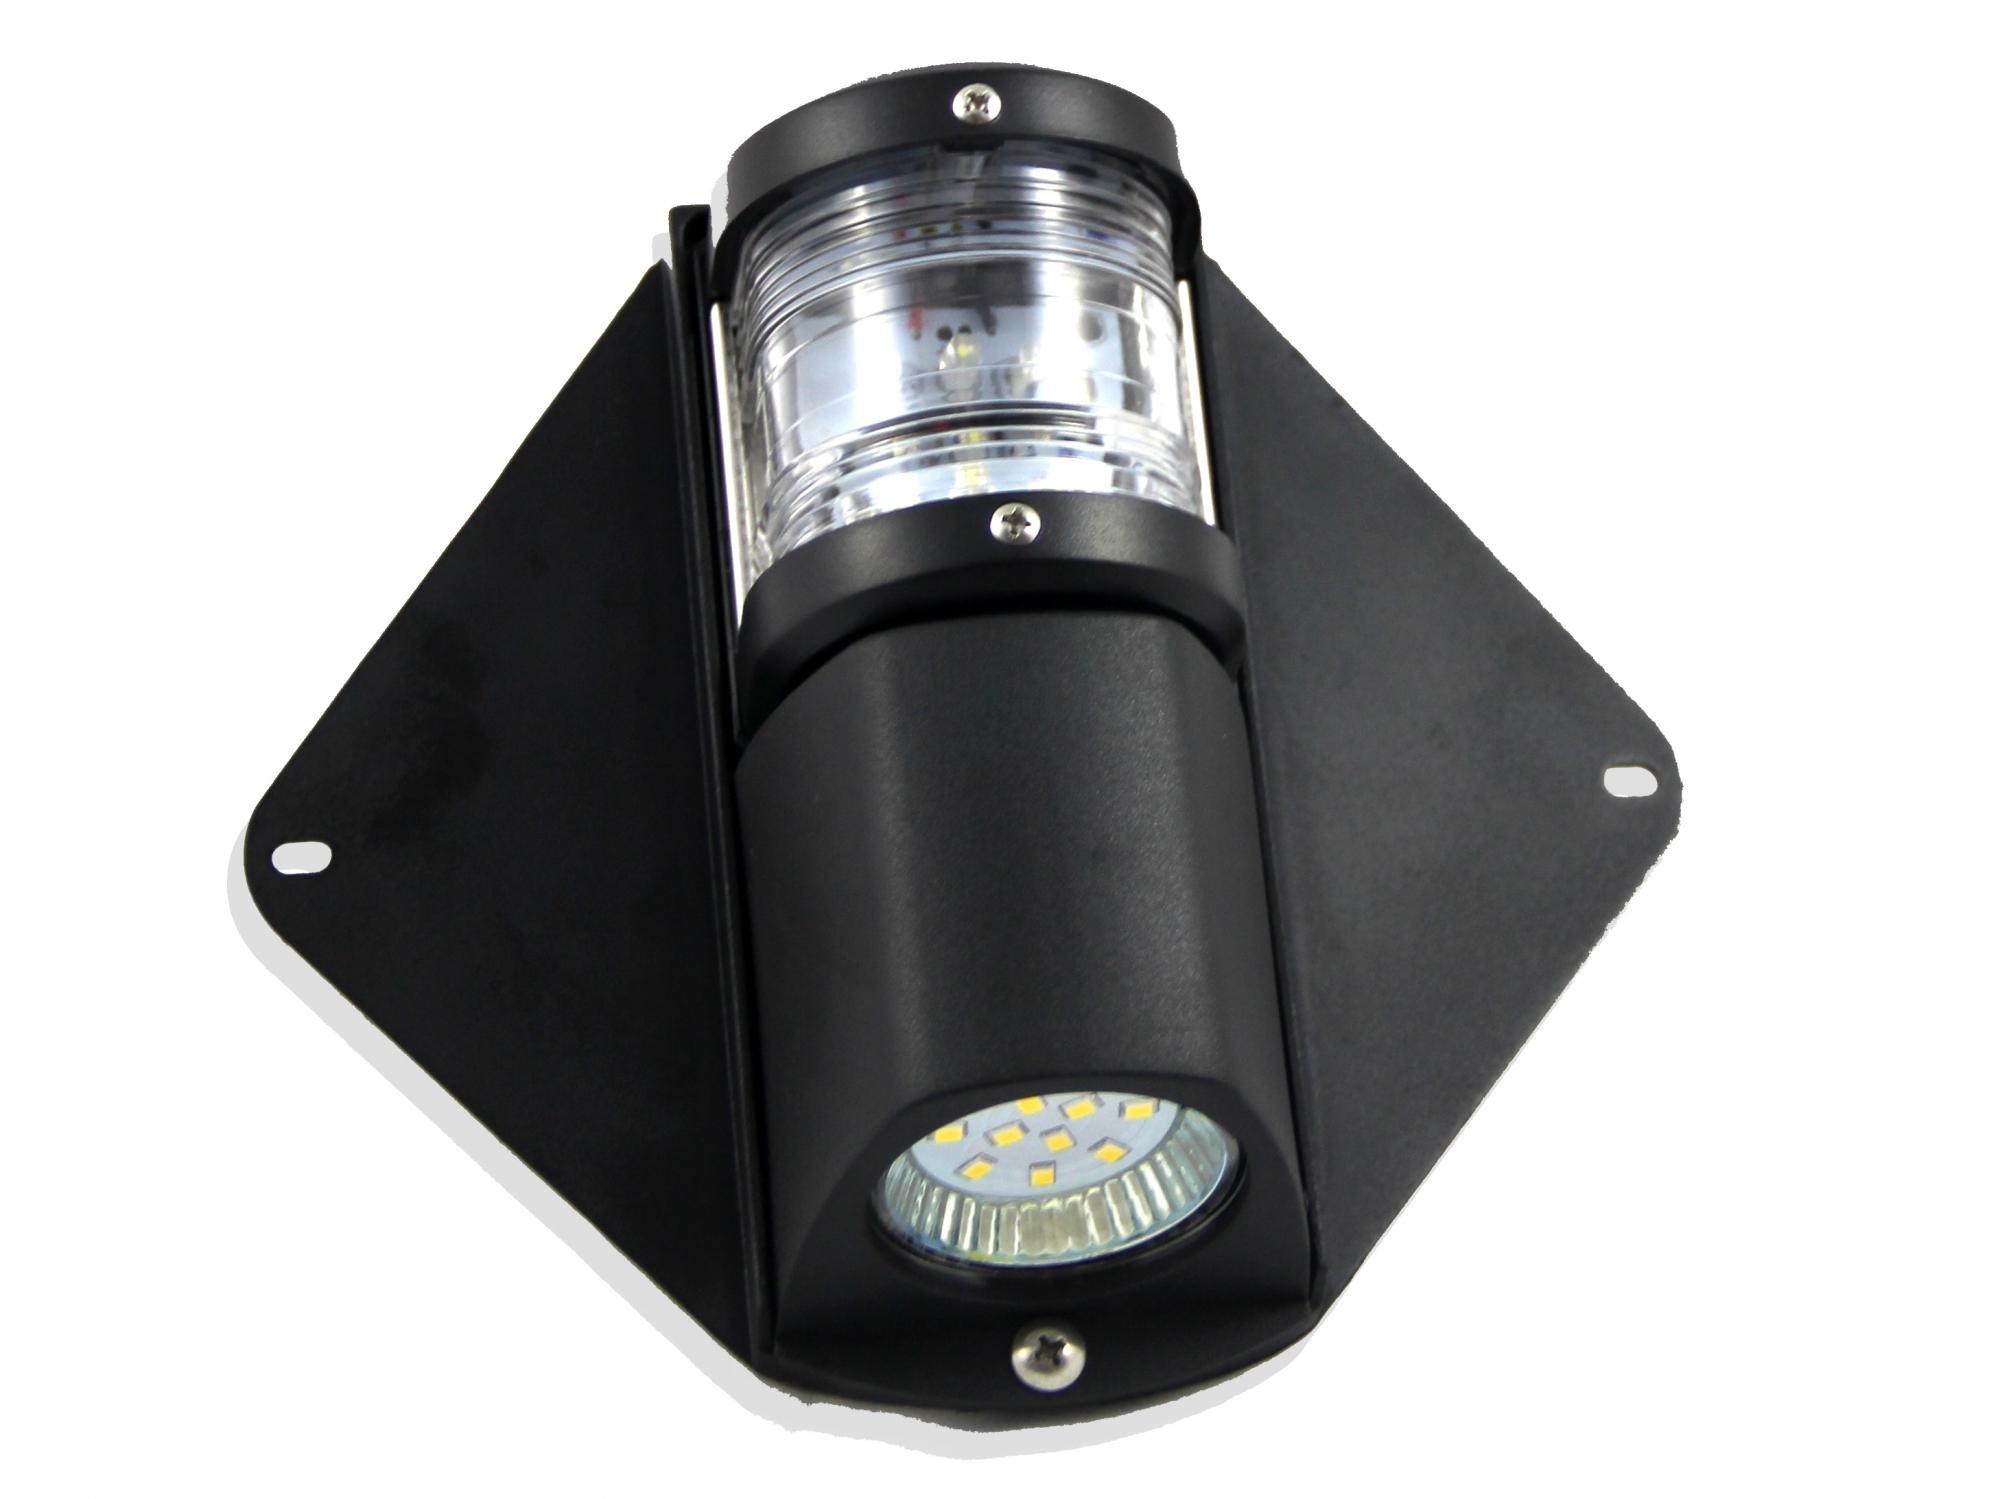 3837 - COMBINED MASTHEAD / DECK LIGHT - 12 V LED